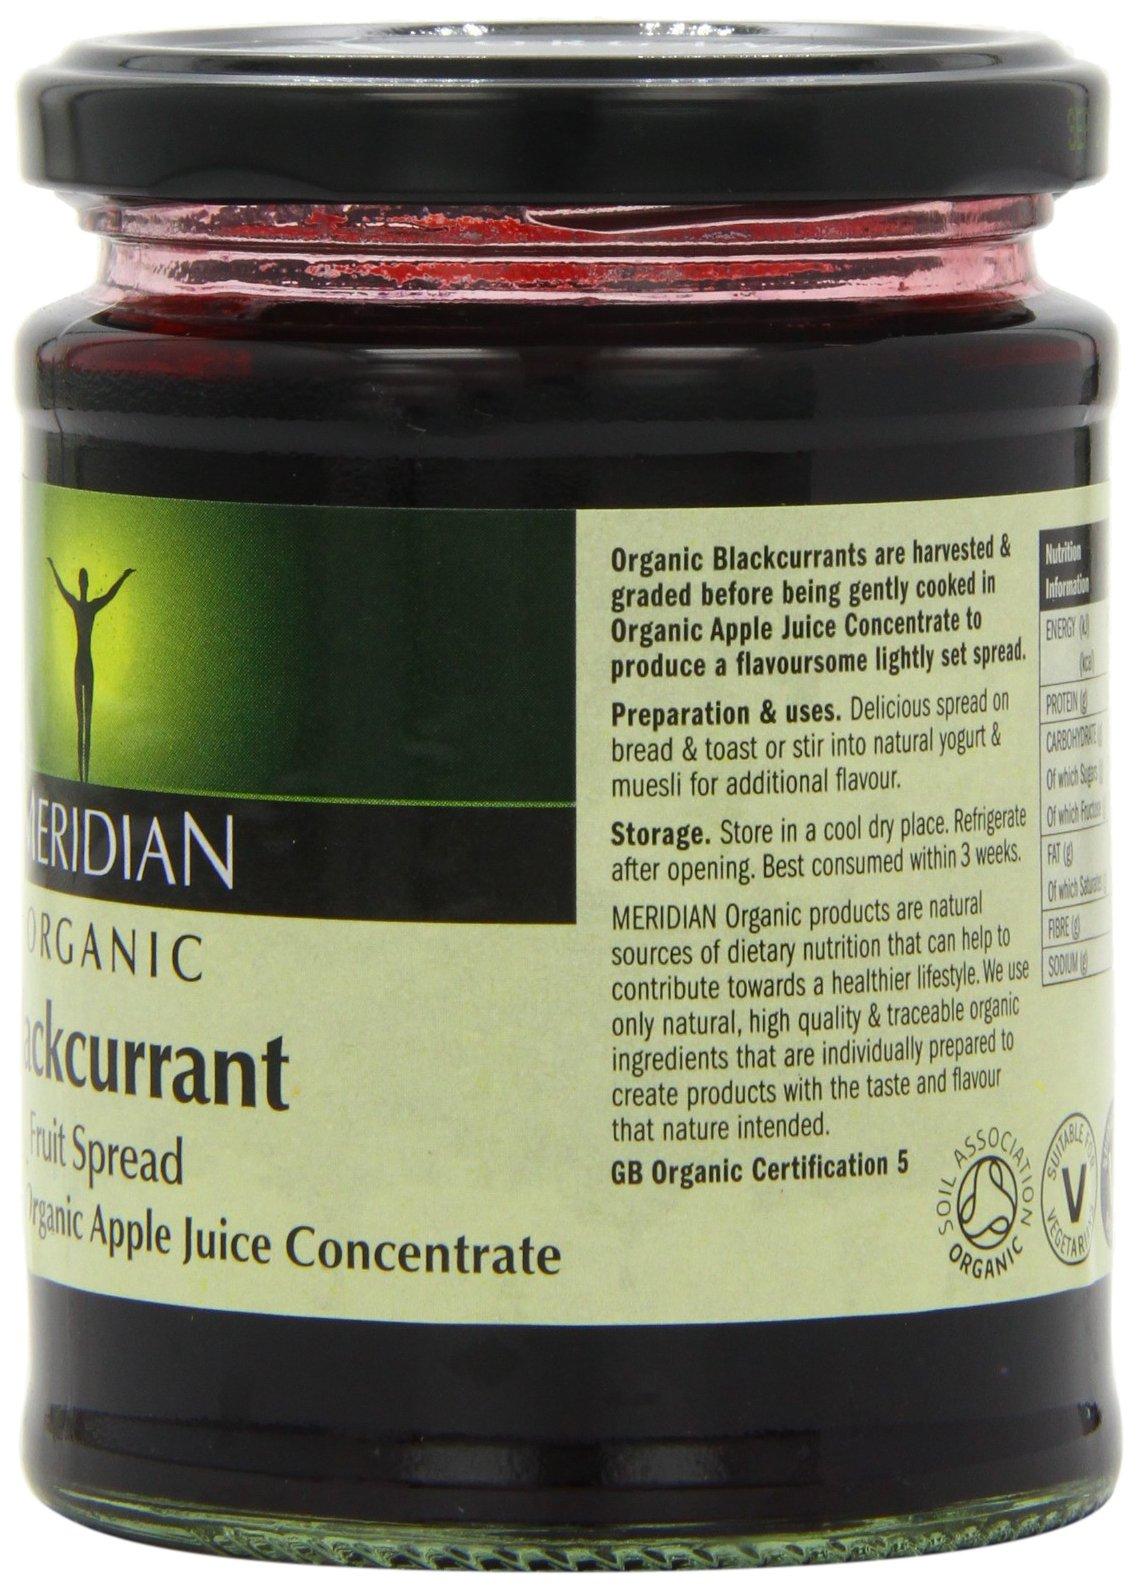 Meridian Organic Blackcurrant Fruit Spread 284 g (Pack of 6) by Meridian (Image #3)